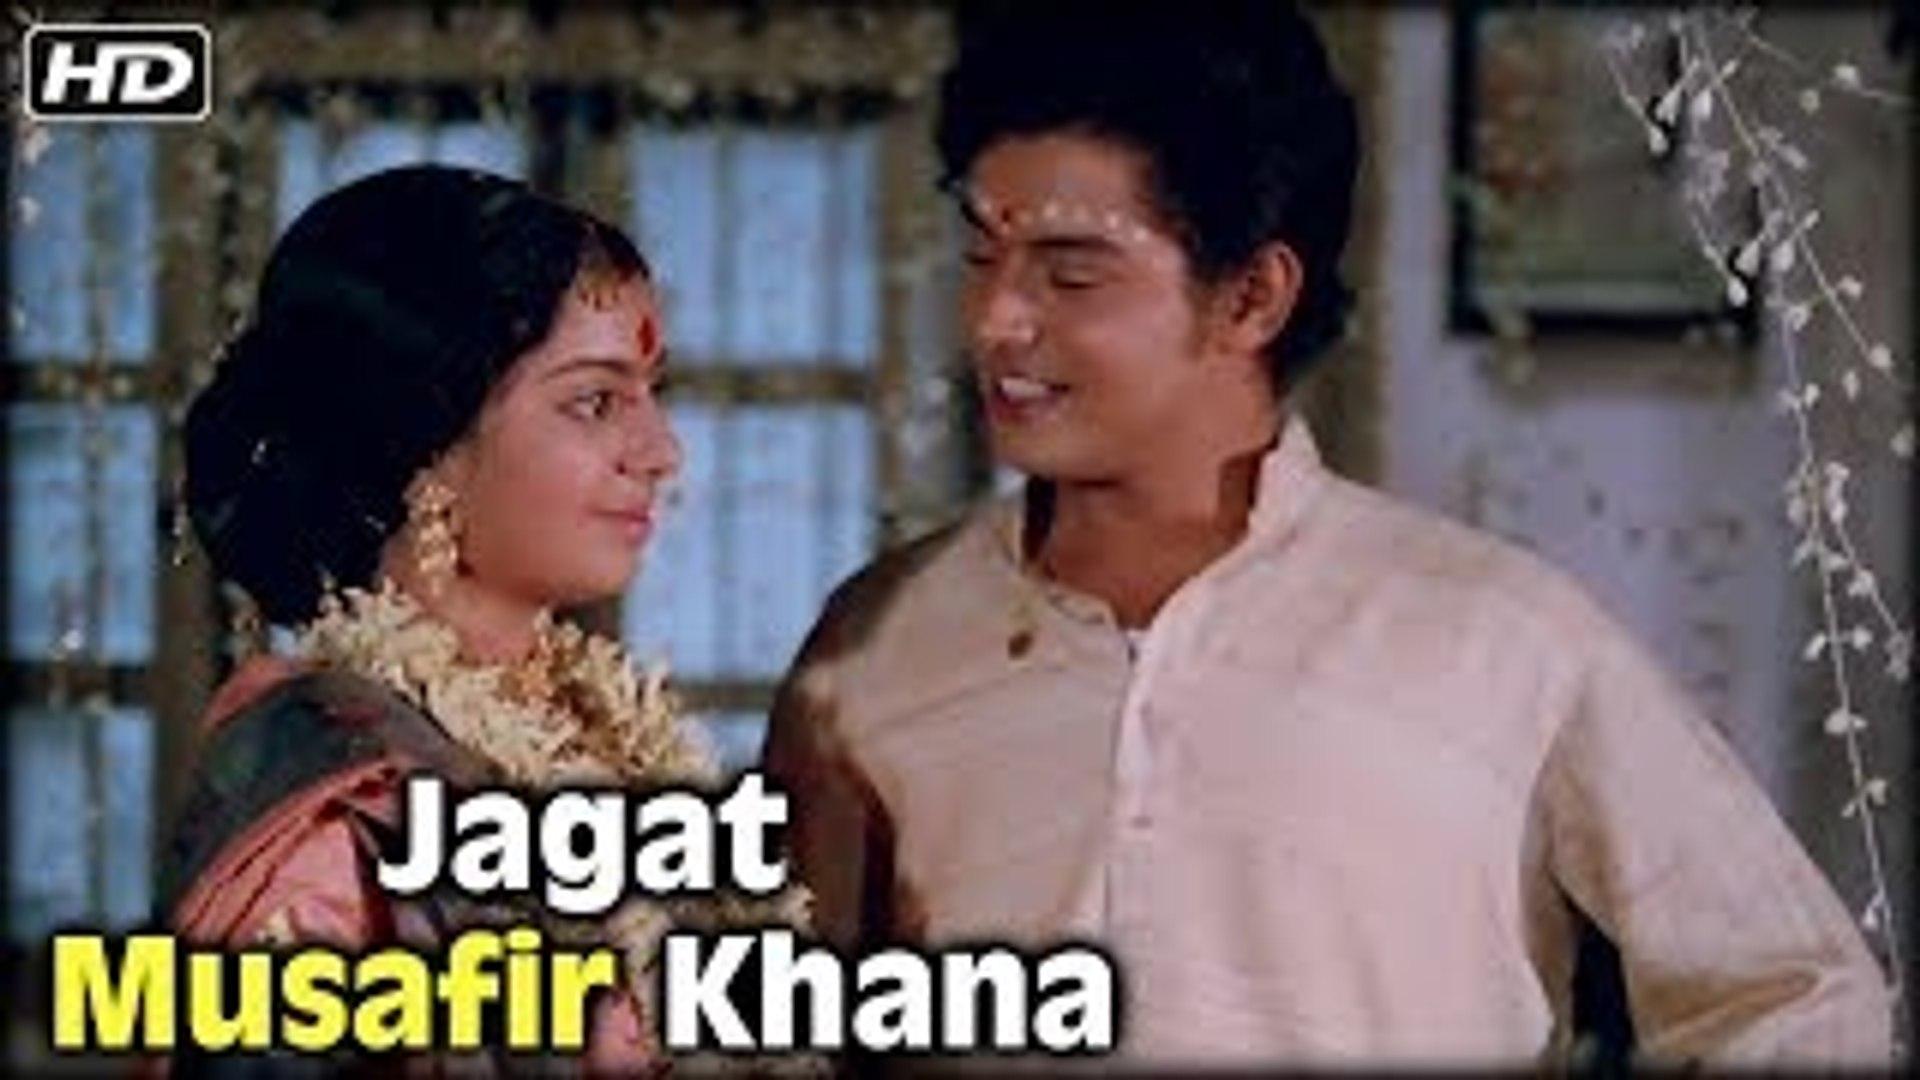 Jagat Musafir Khana Full Video Song | Balika Badhu Songs | R. D. Burman Songs | Anand Bakshi Hits